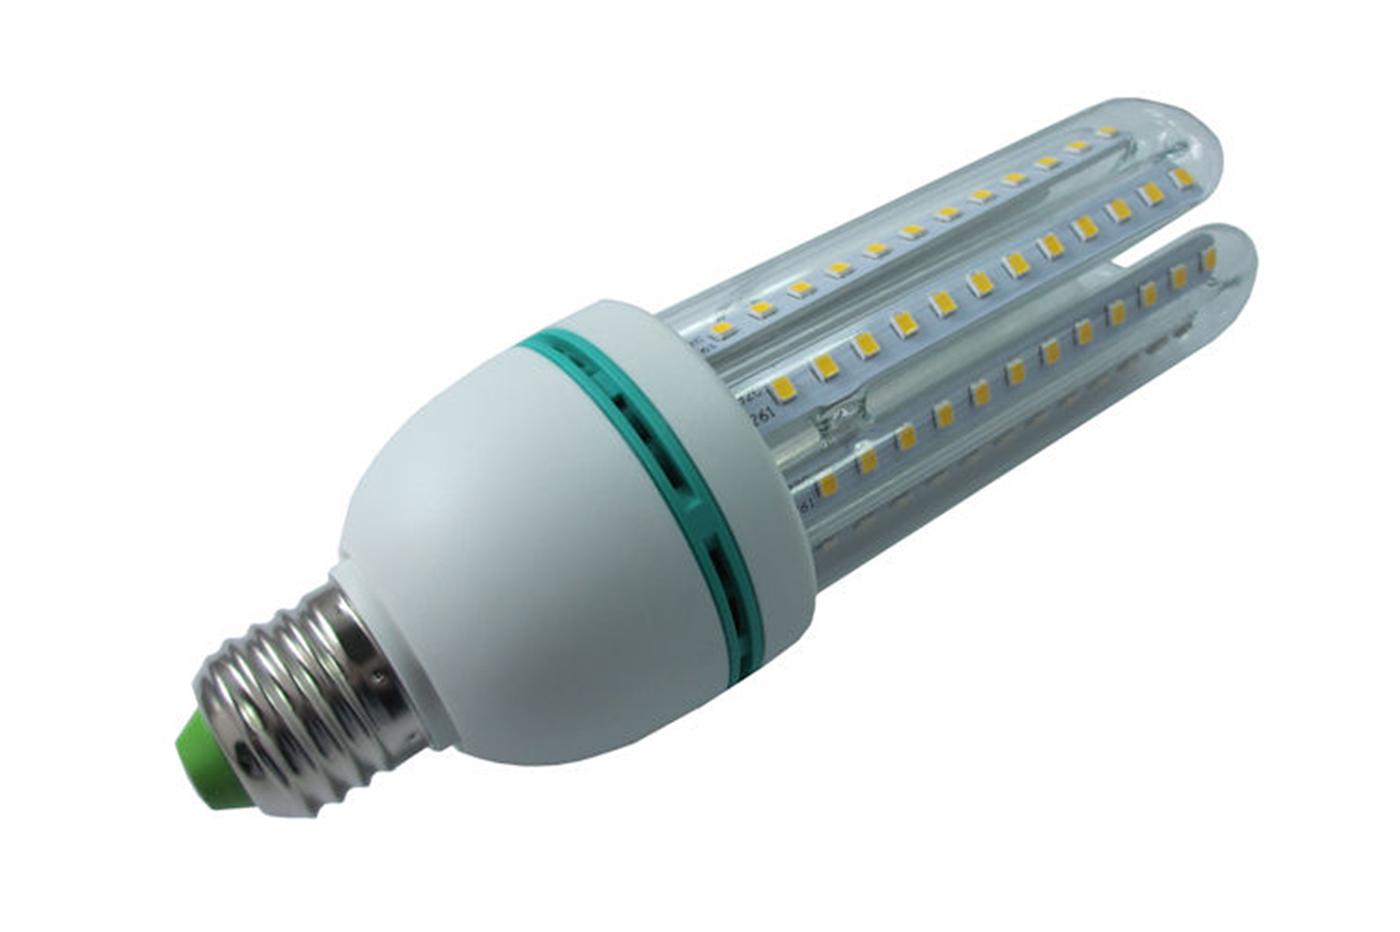 Lampade Globo A Basso Consumo : Bes 24607 lampadine e adattatori beselettronica lampadina led